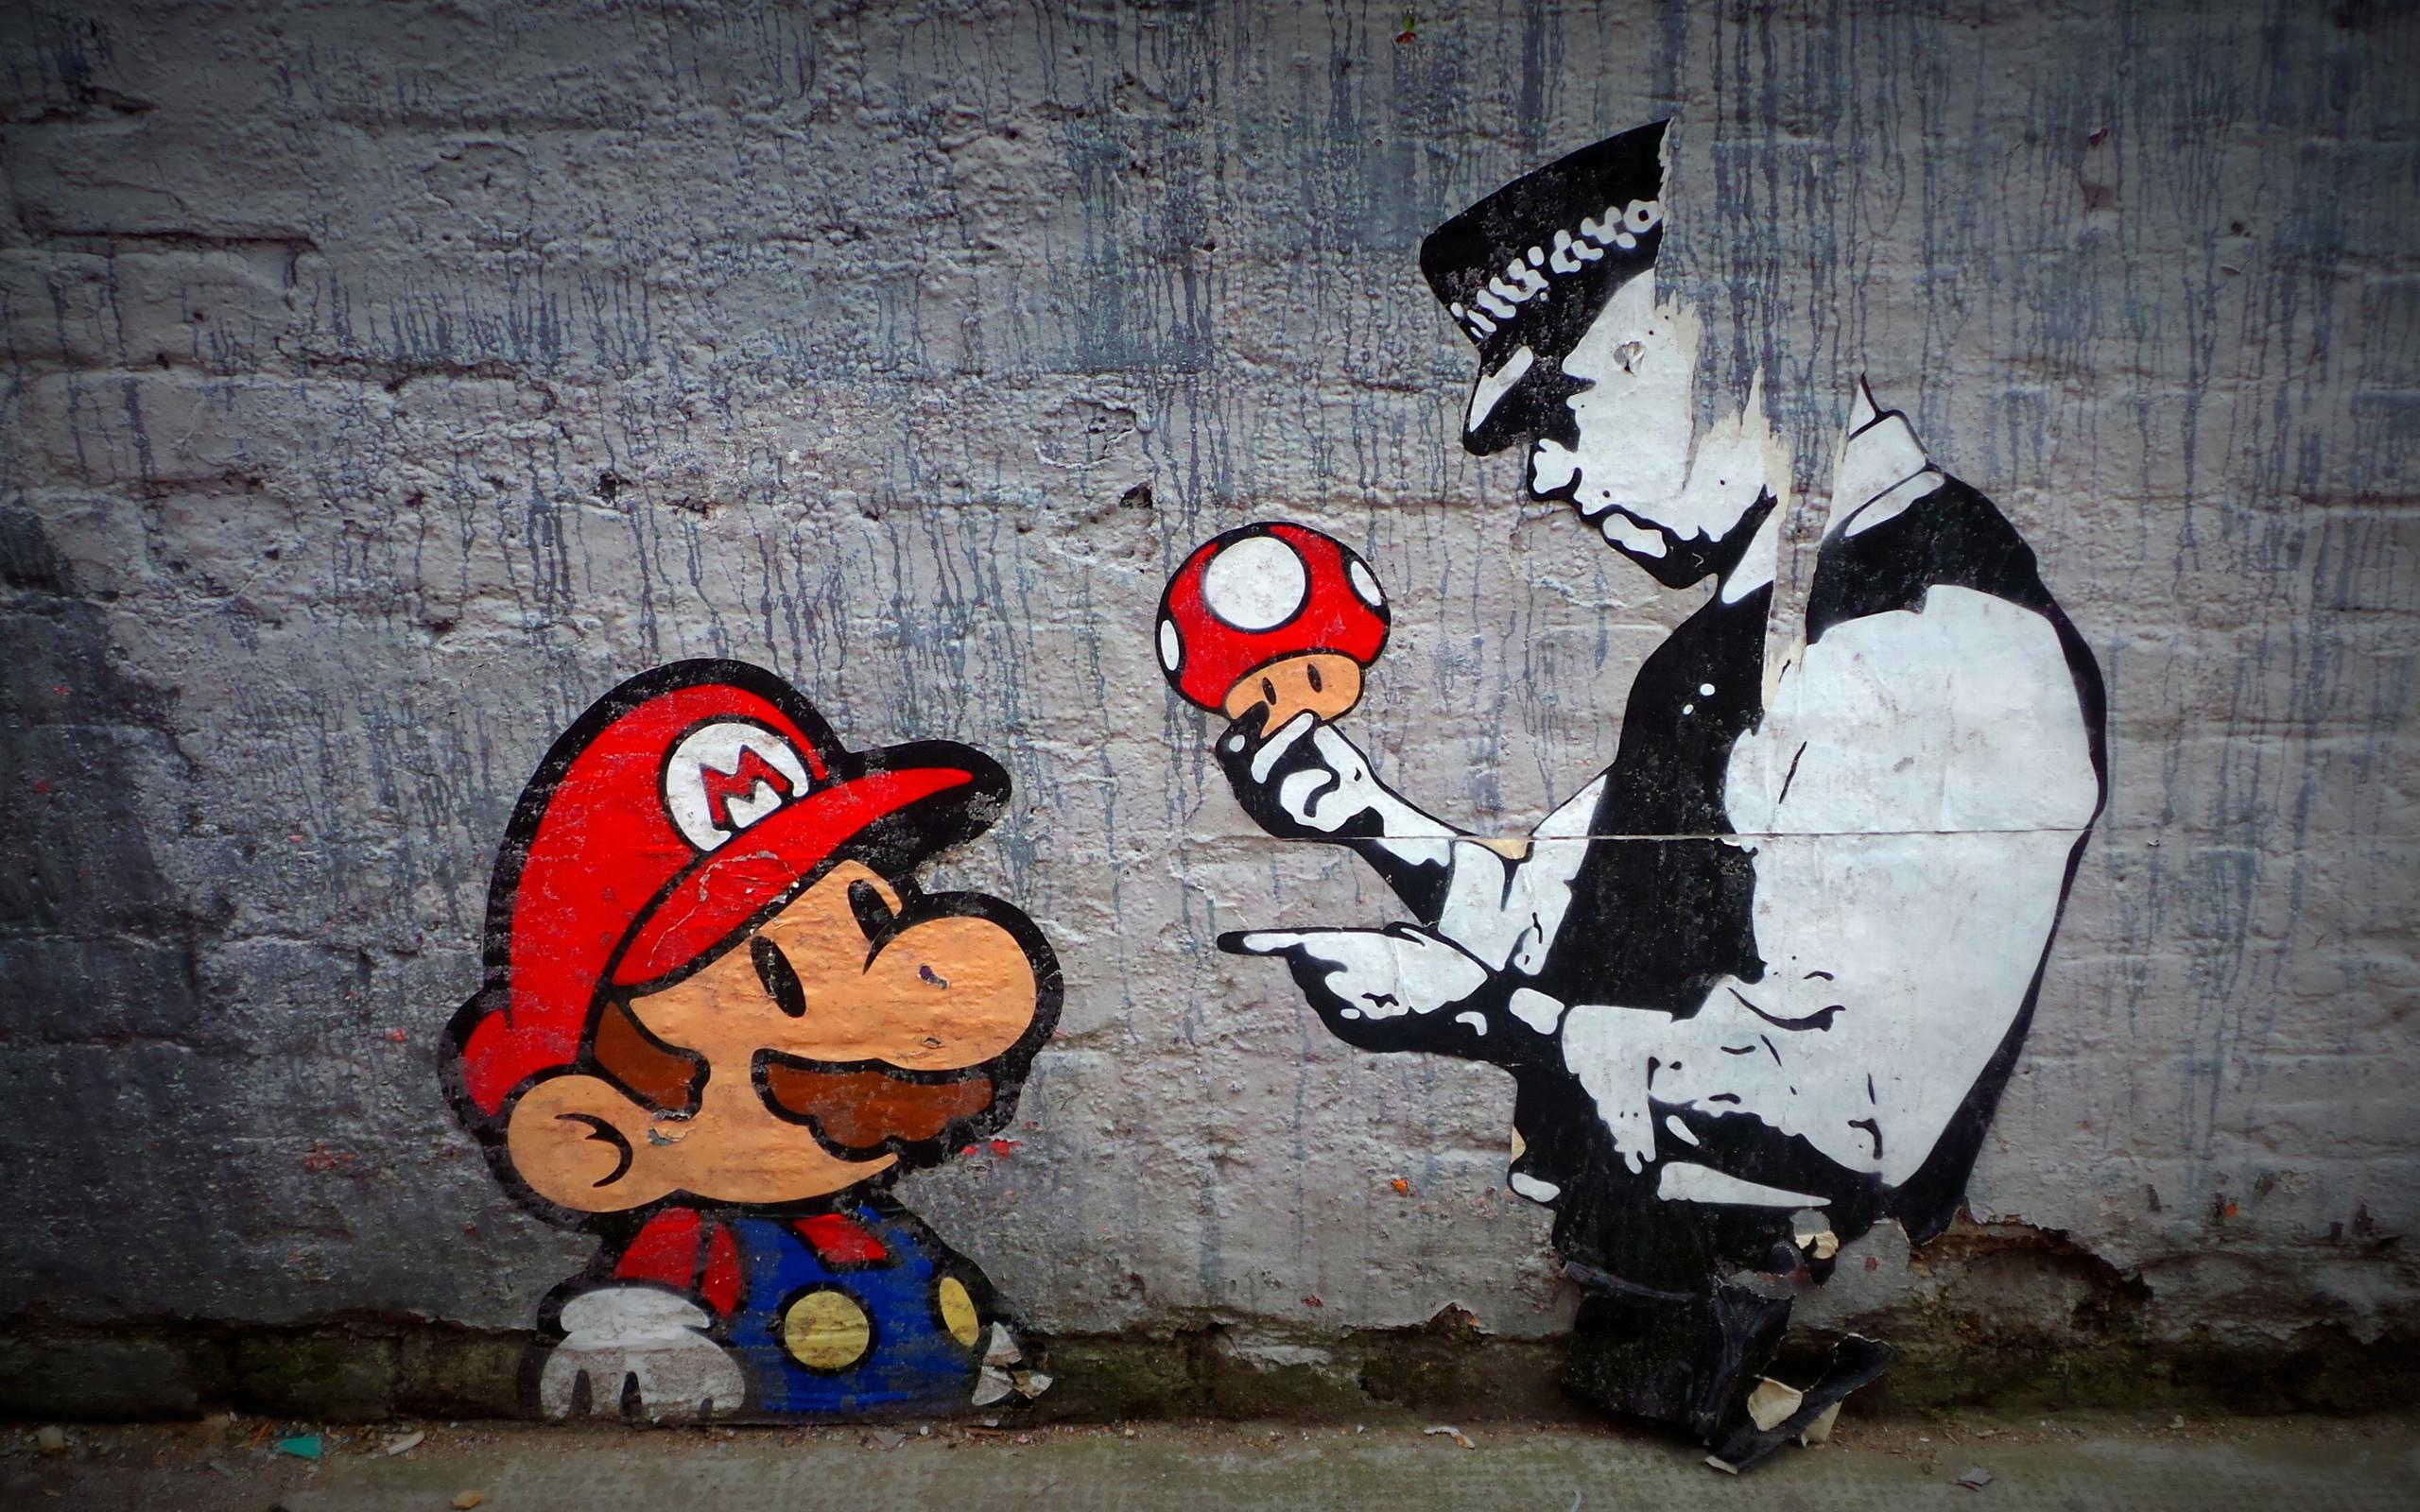 Wall Street, Street Art, Policeman, Mario, Wall Street Art